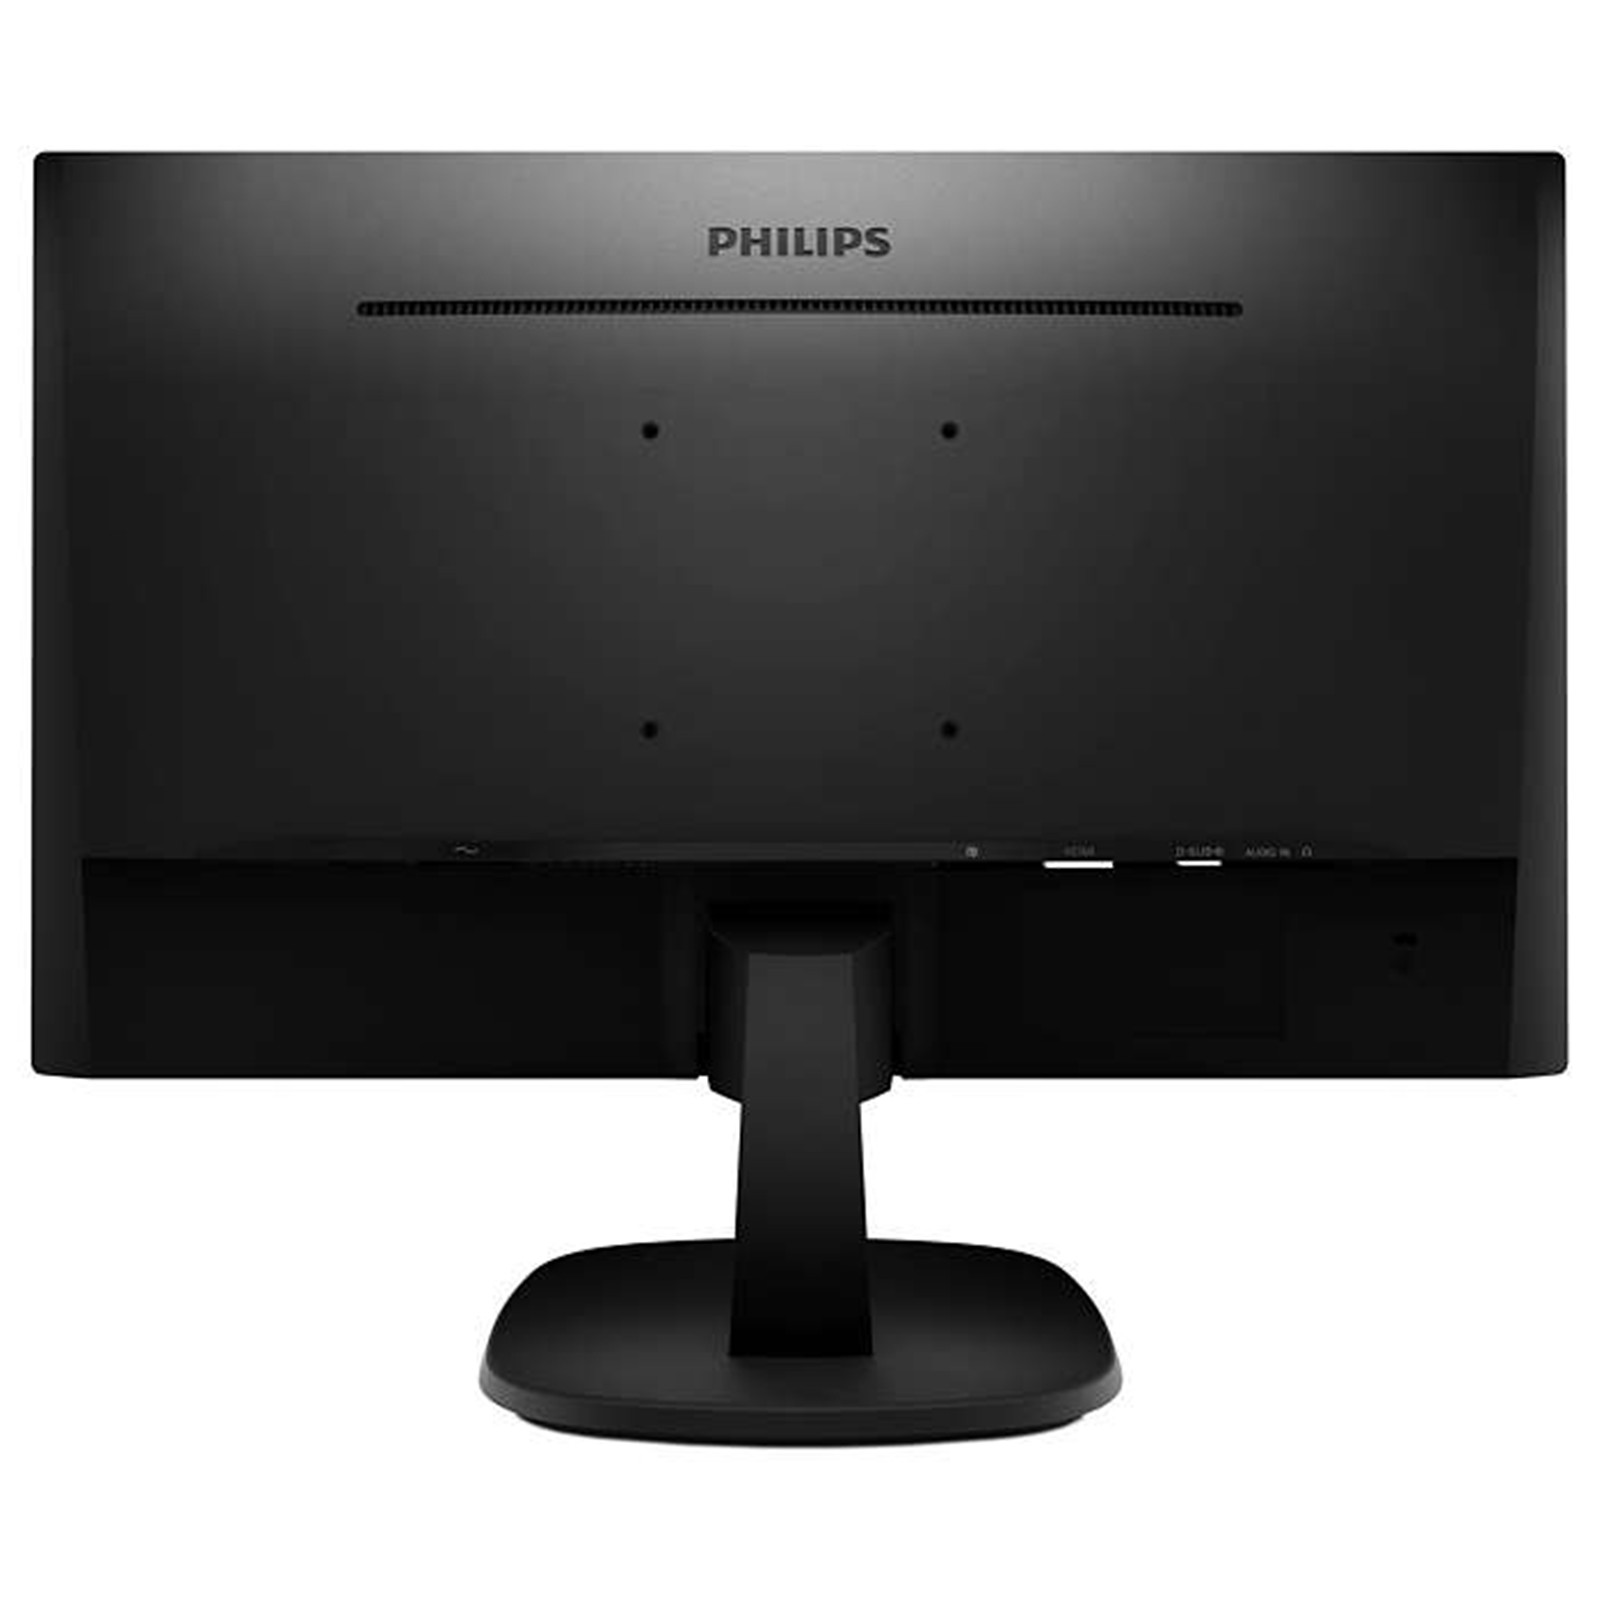 "PHILIPS 21.5"" FULL HD SLIMLINE MONITOR WITH SPEAKERS"